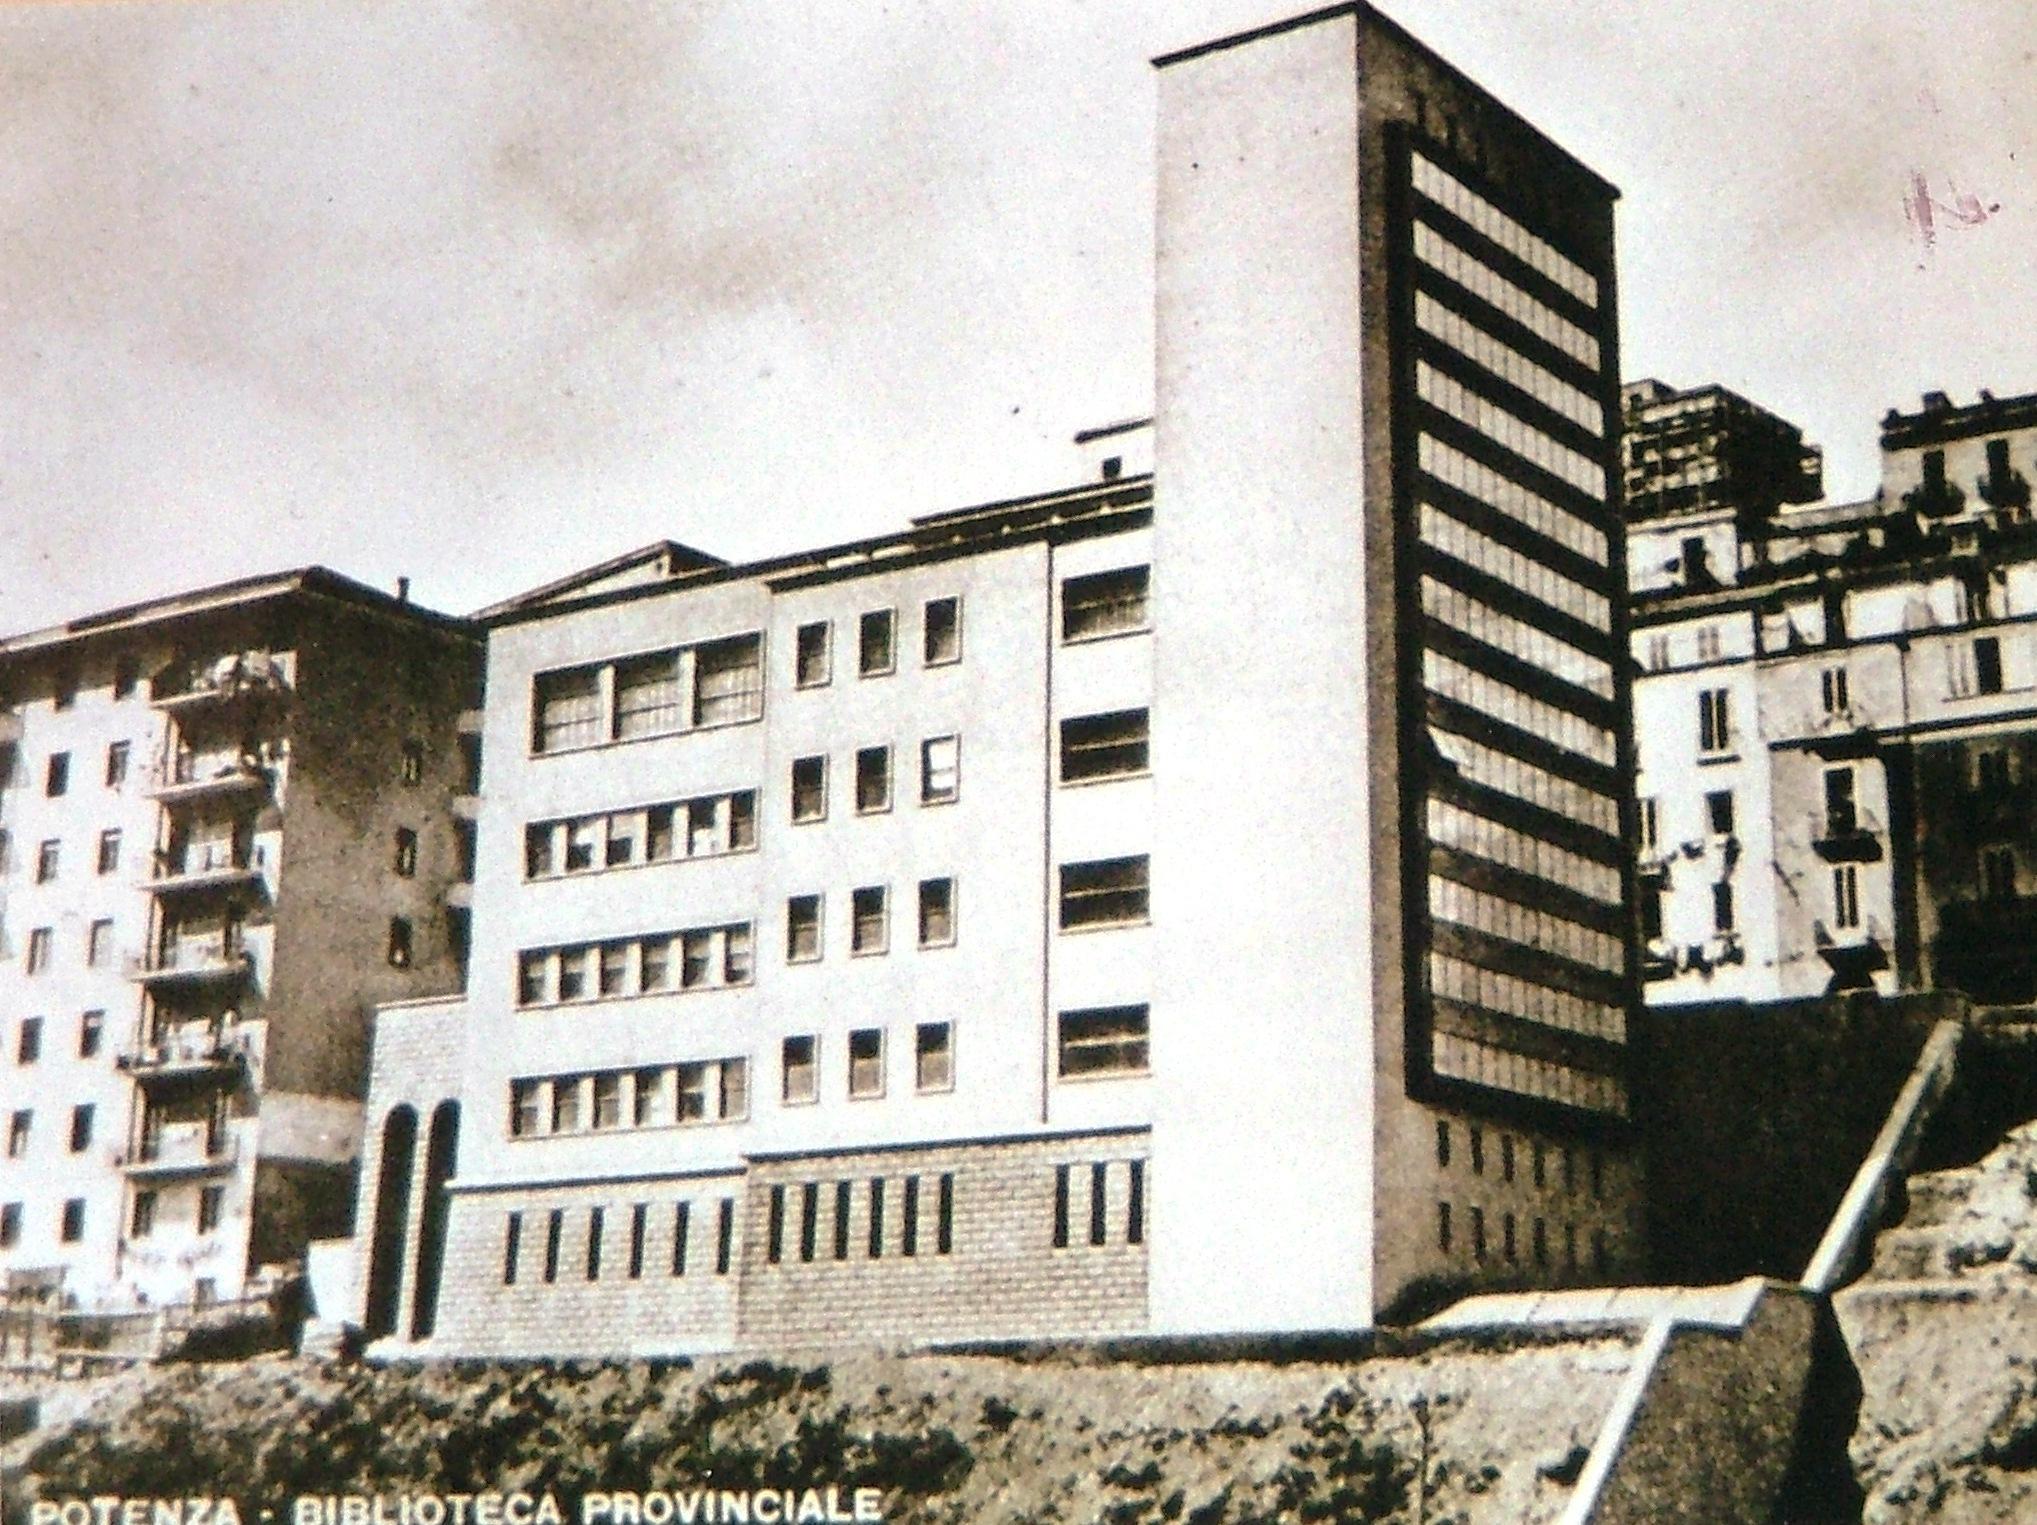 La Biblioteca Provinciale - Cartolina d'epoca - (1940) - (1)